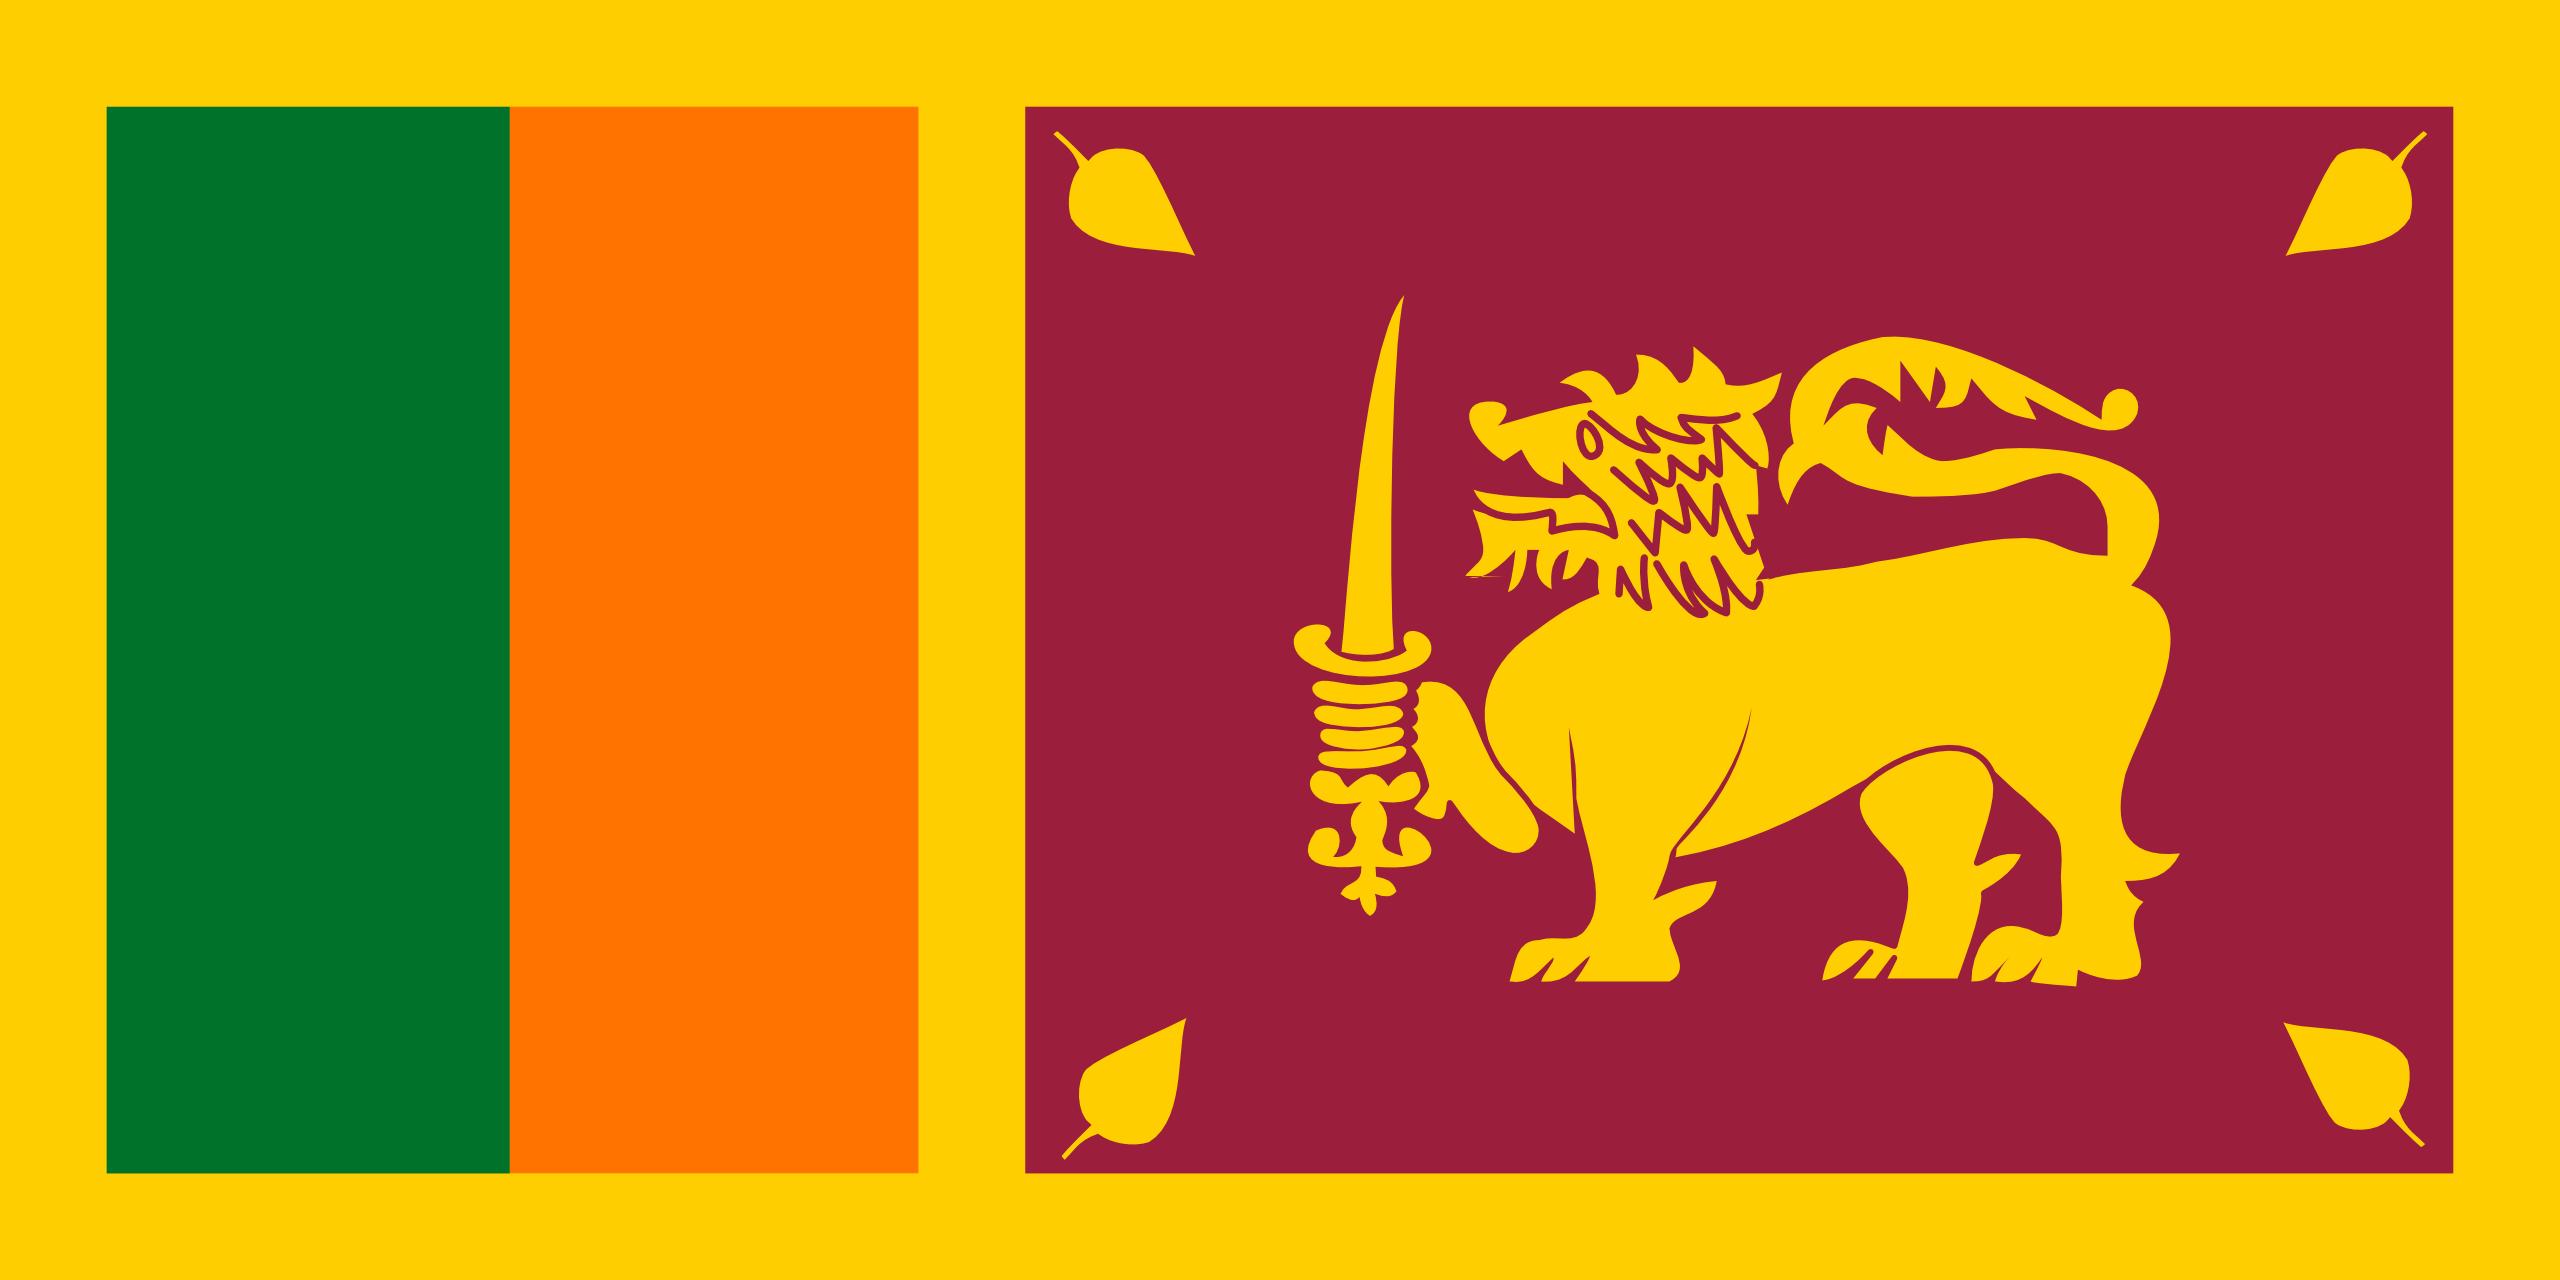 sri lanka, 国家, 会徽, 徽标, 符号 - 高清壁纸 - 教授-falken.com